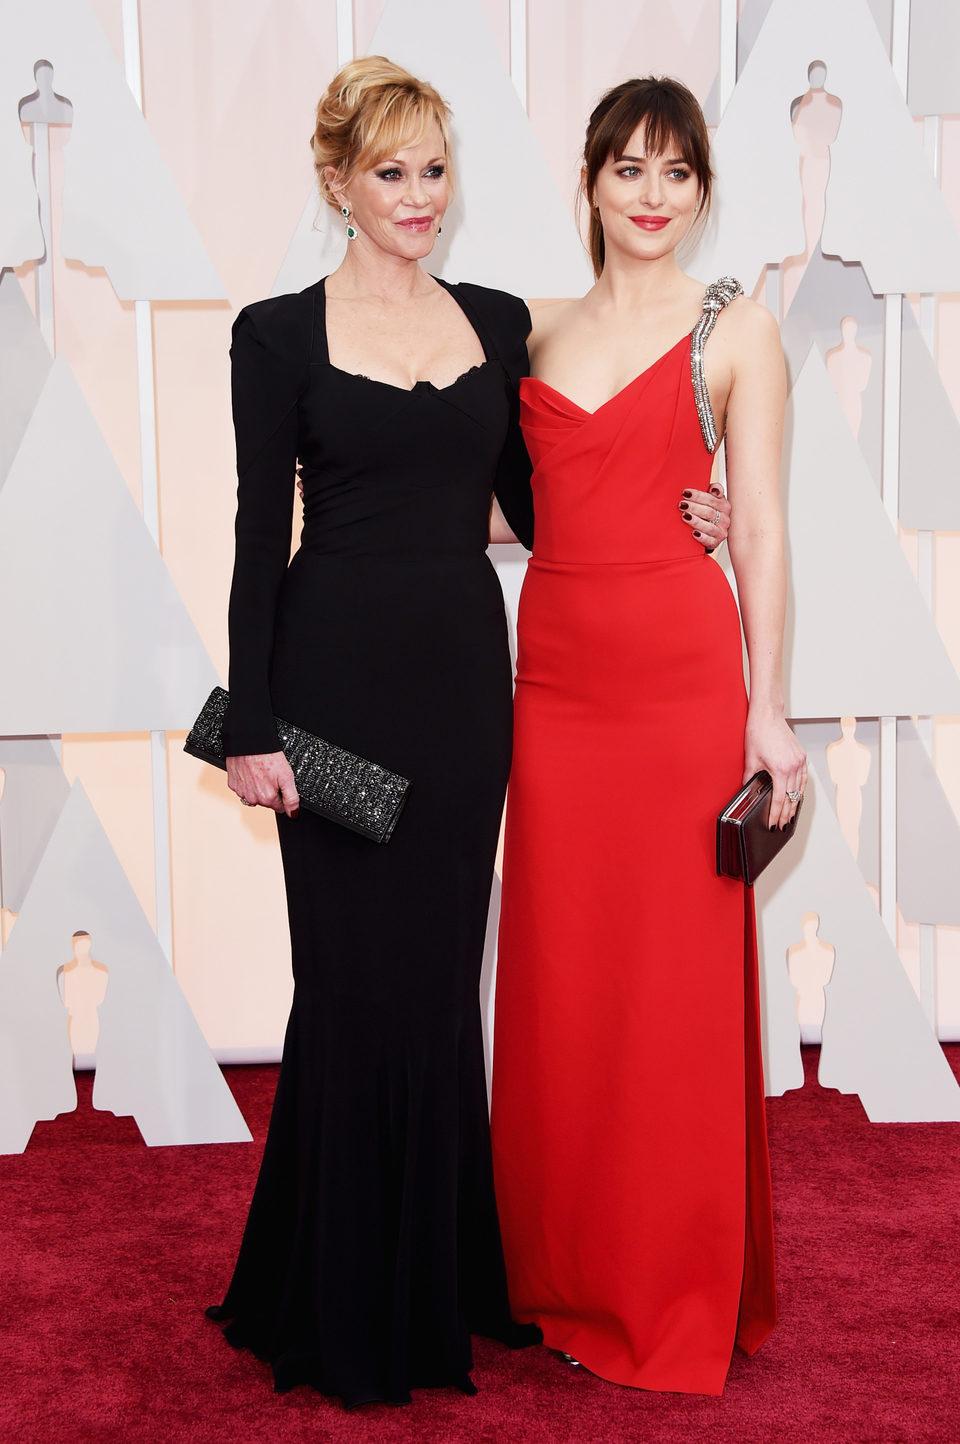 Dakota Johnson and Melanie Griffth at the Oscar 2015 red carpet